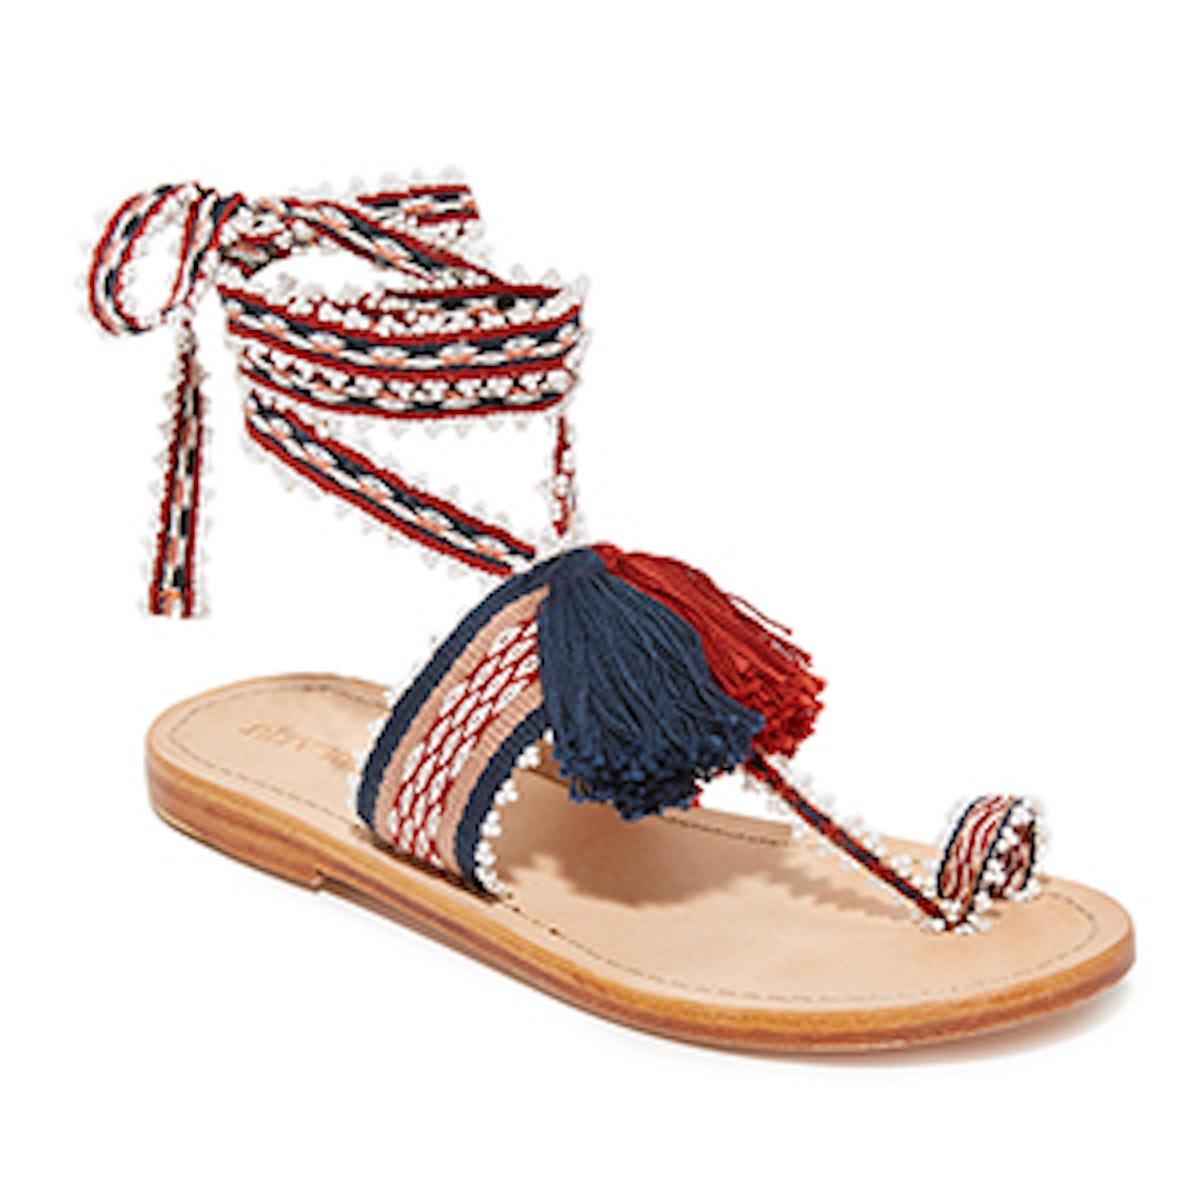 Zandra Handloom Sandals